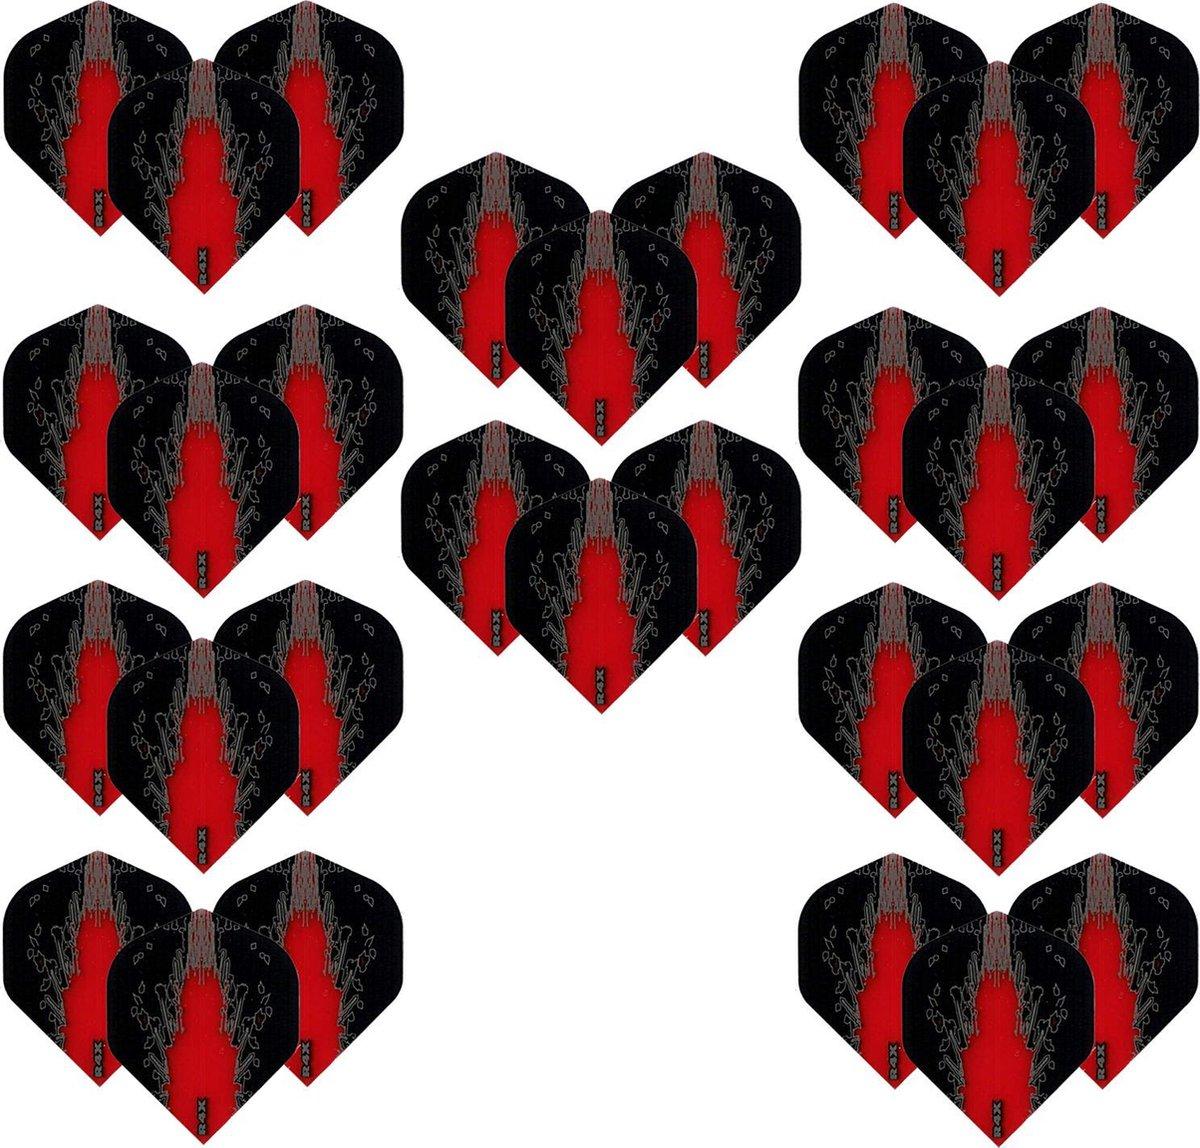 Dragon Darts - High Impact - 10 sets (30 stuks) - darts flights - Best Getest - Rood